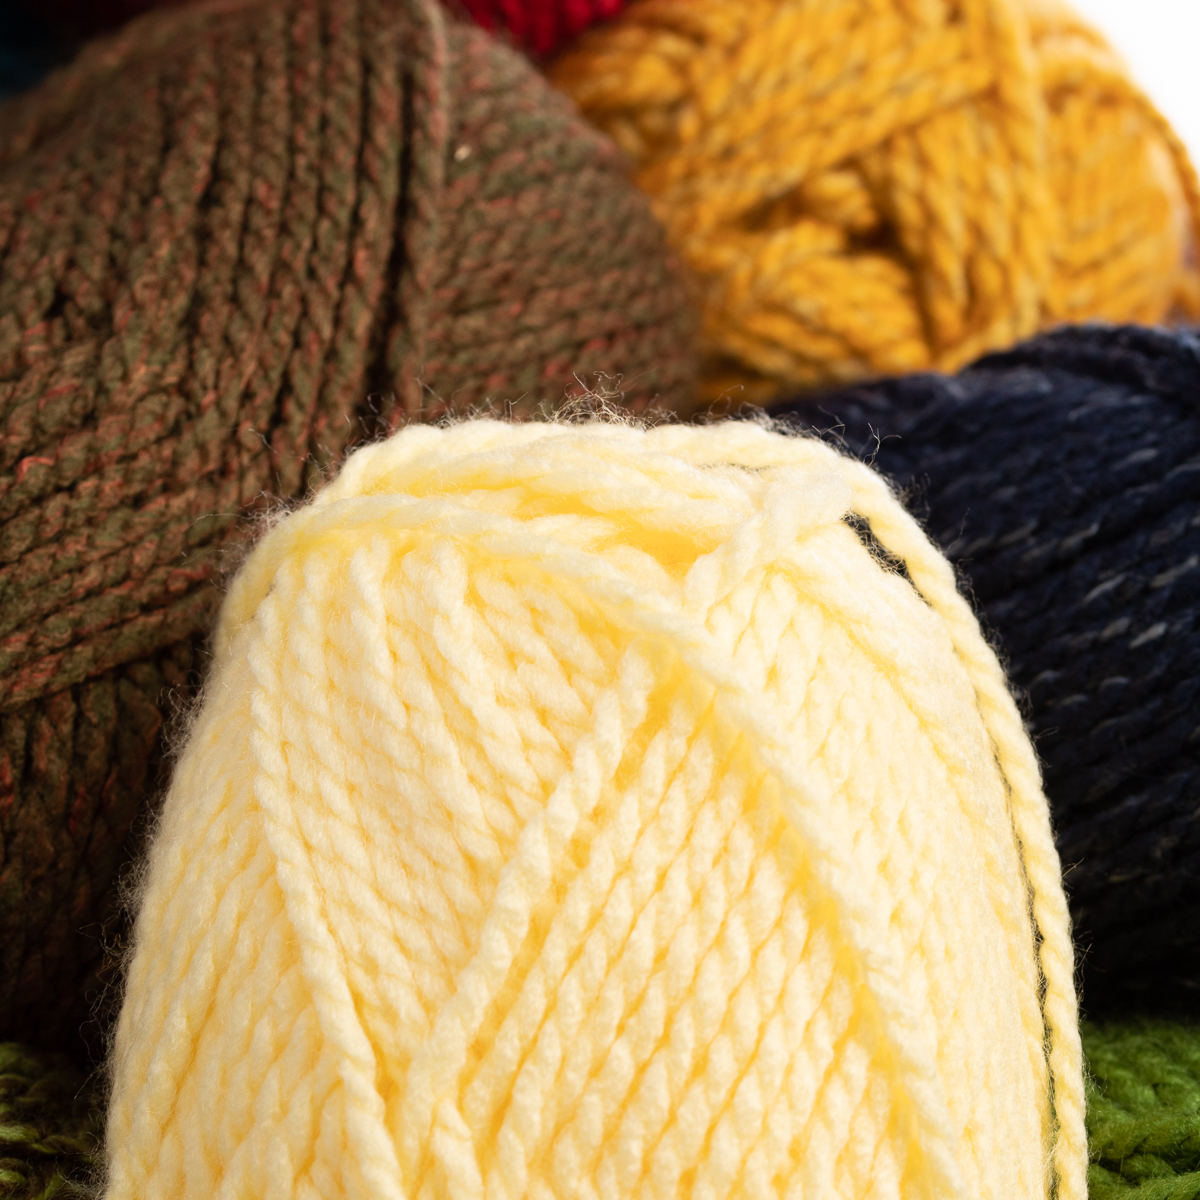 3pk-Premier-Yarns-Deborah-Norville-Serenity-100-Acrylic-Yarn-Chunky-5-Knitting thumbnail 19